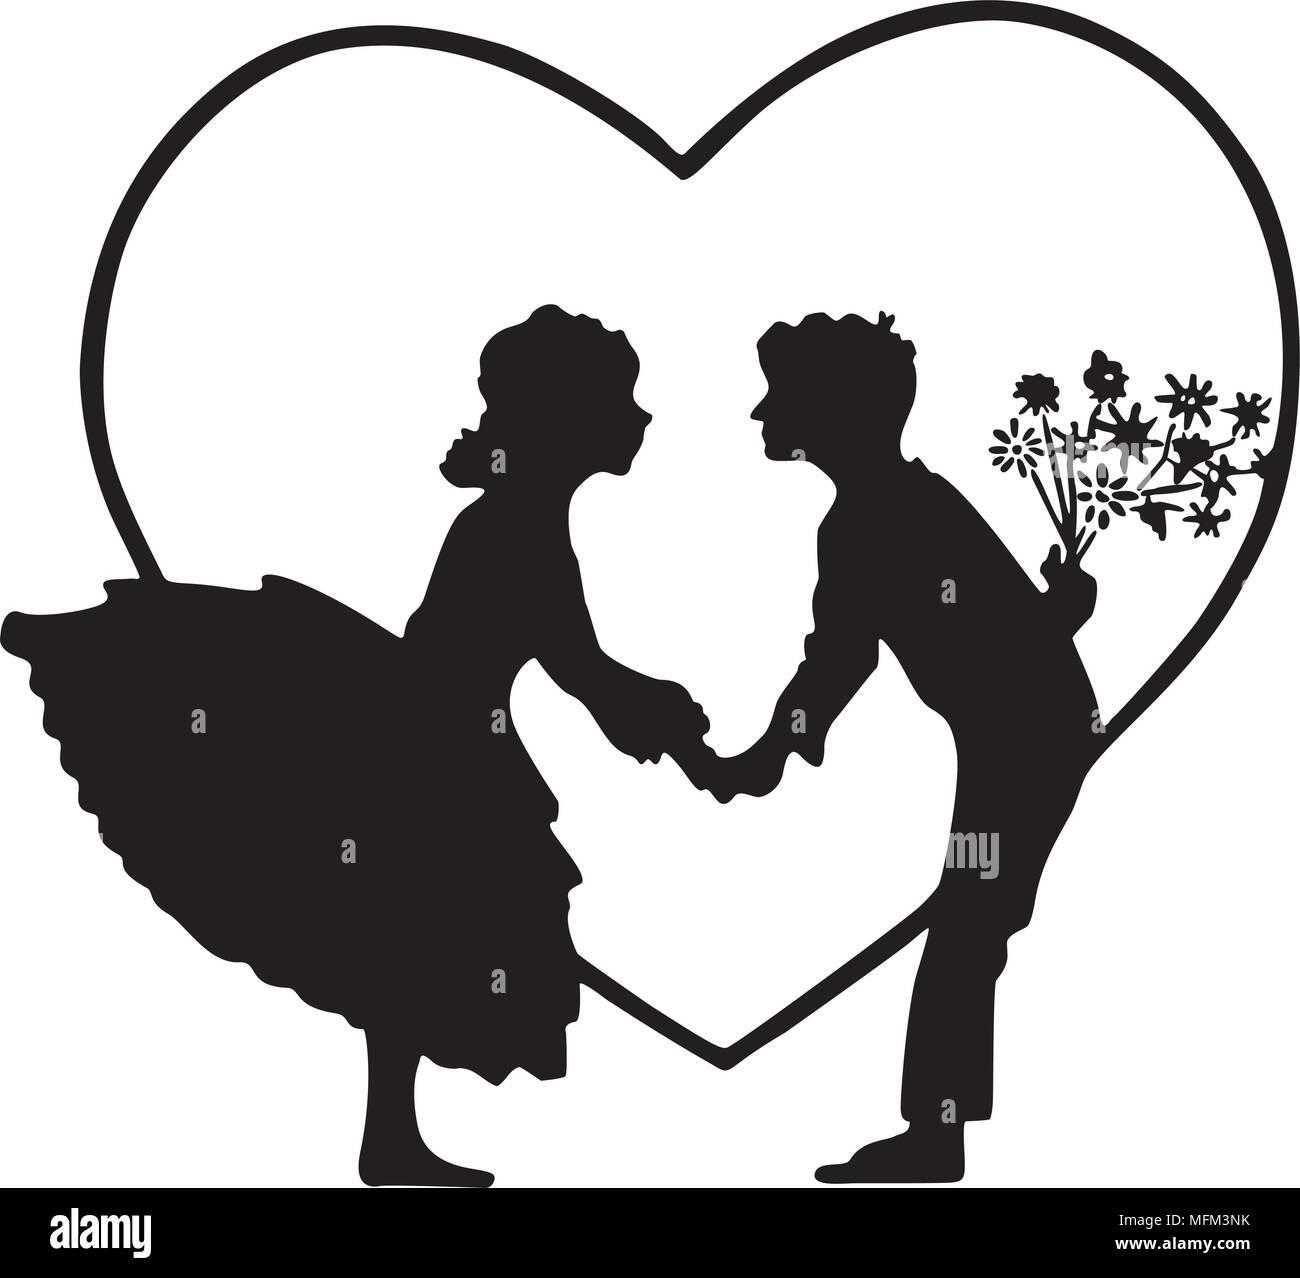 Lovers In Heart Silhouette - Retro Clipart Illustration